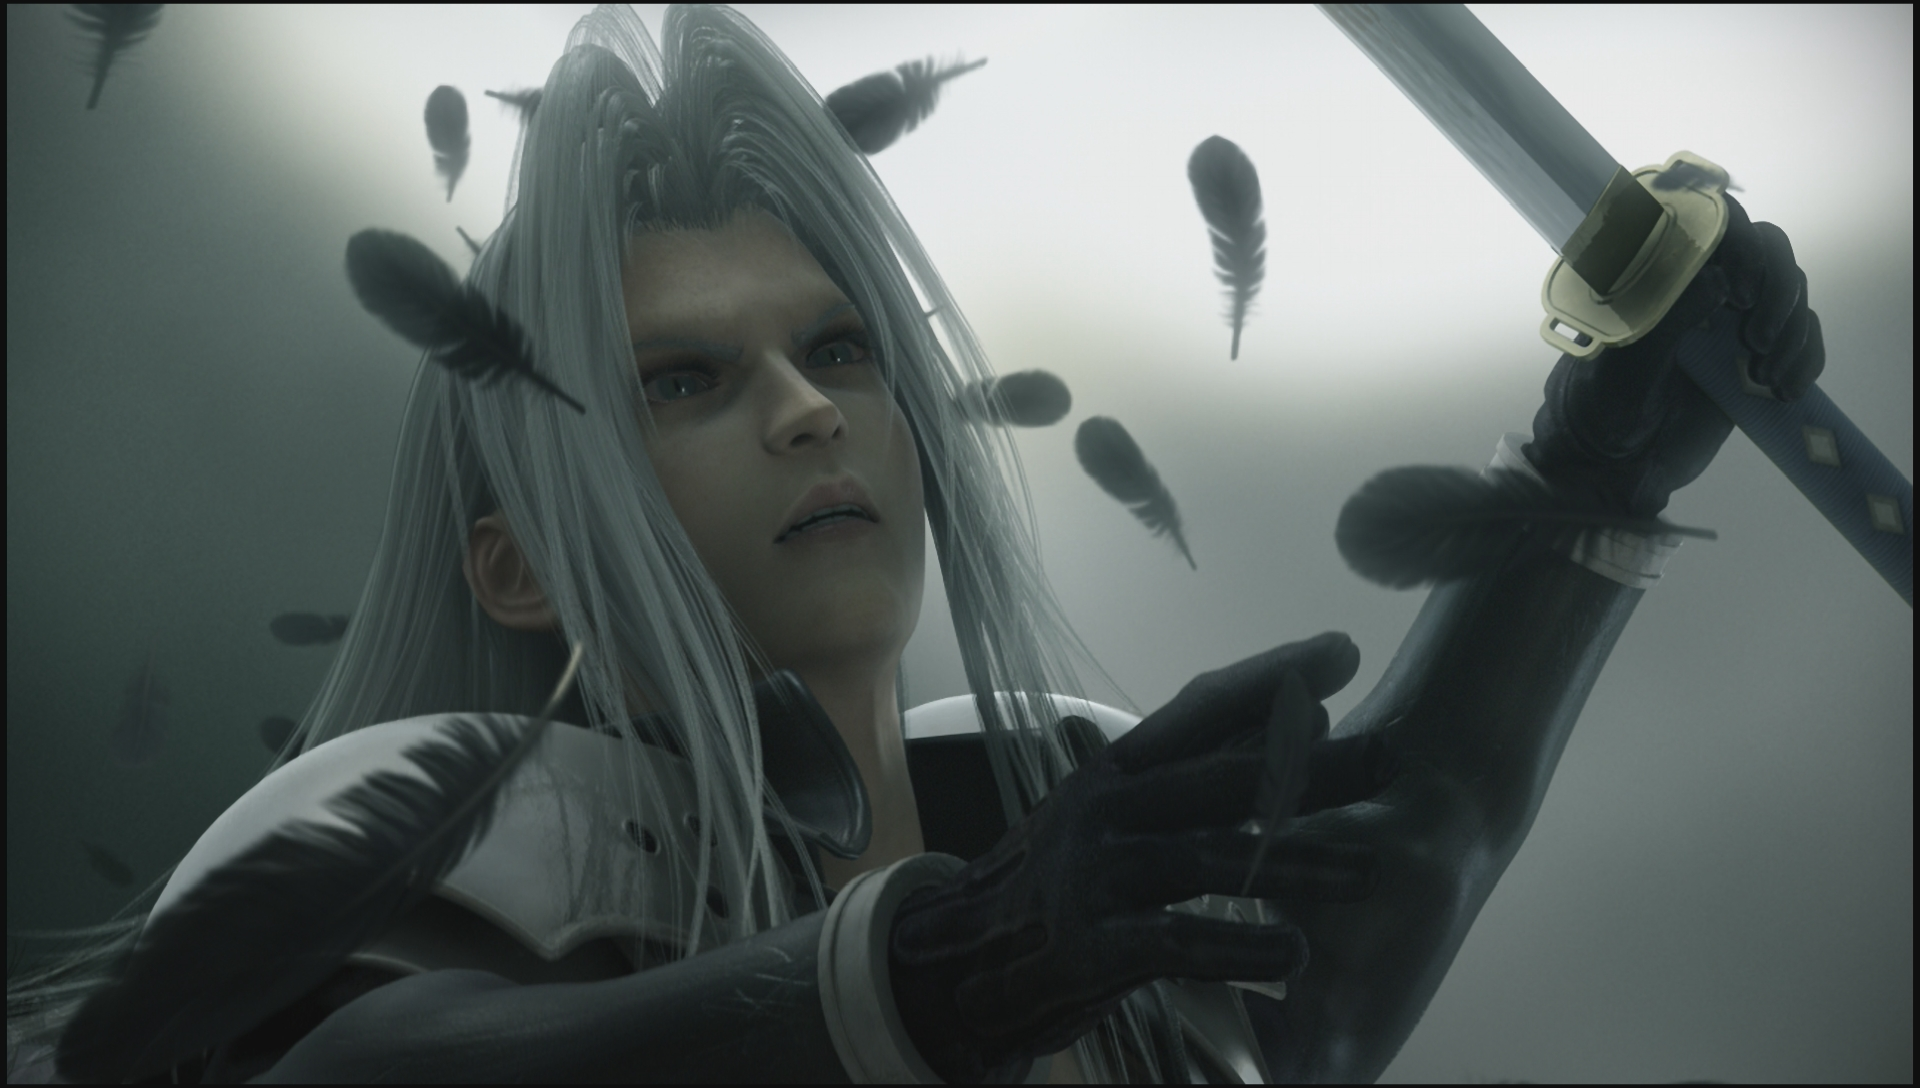 Image Sephiroth Battle Jpg The Final Fantasy Wiki 10